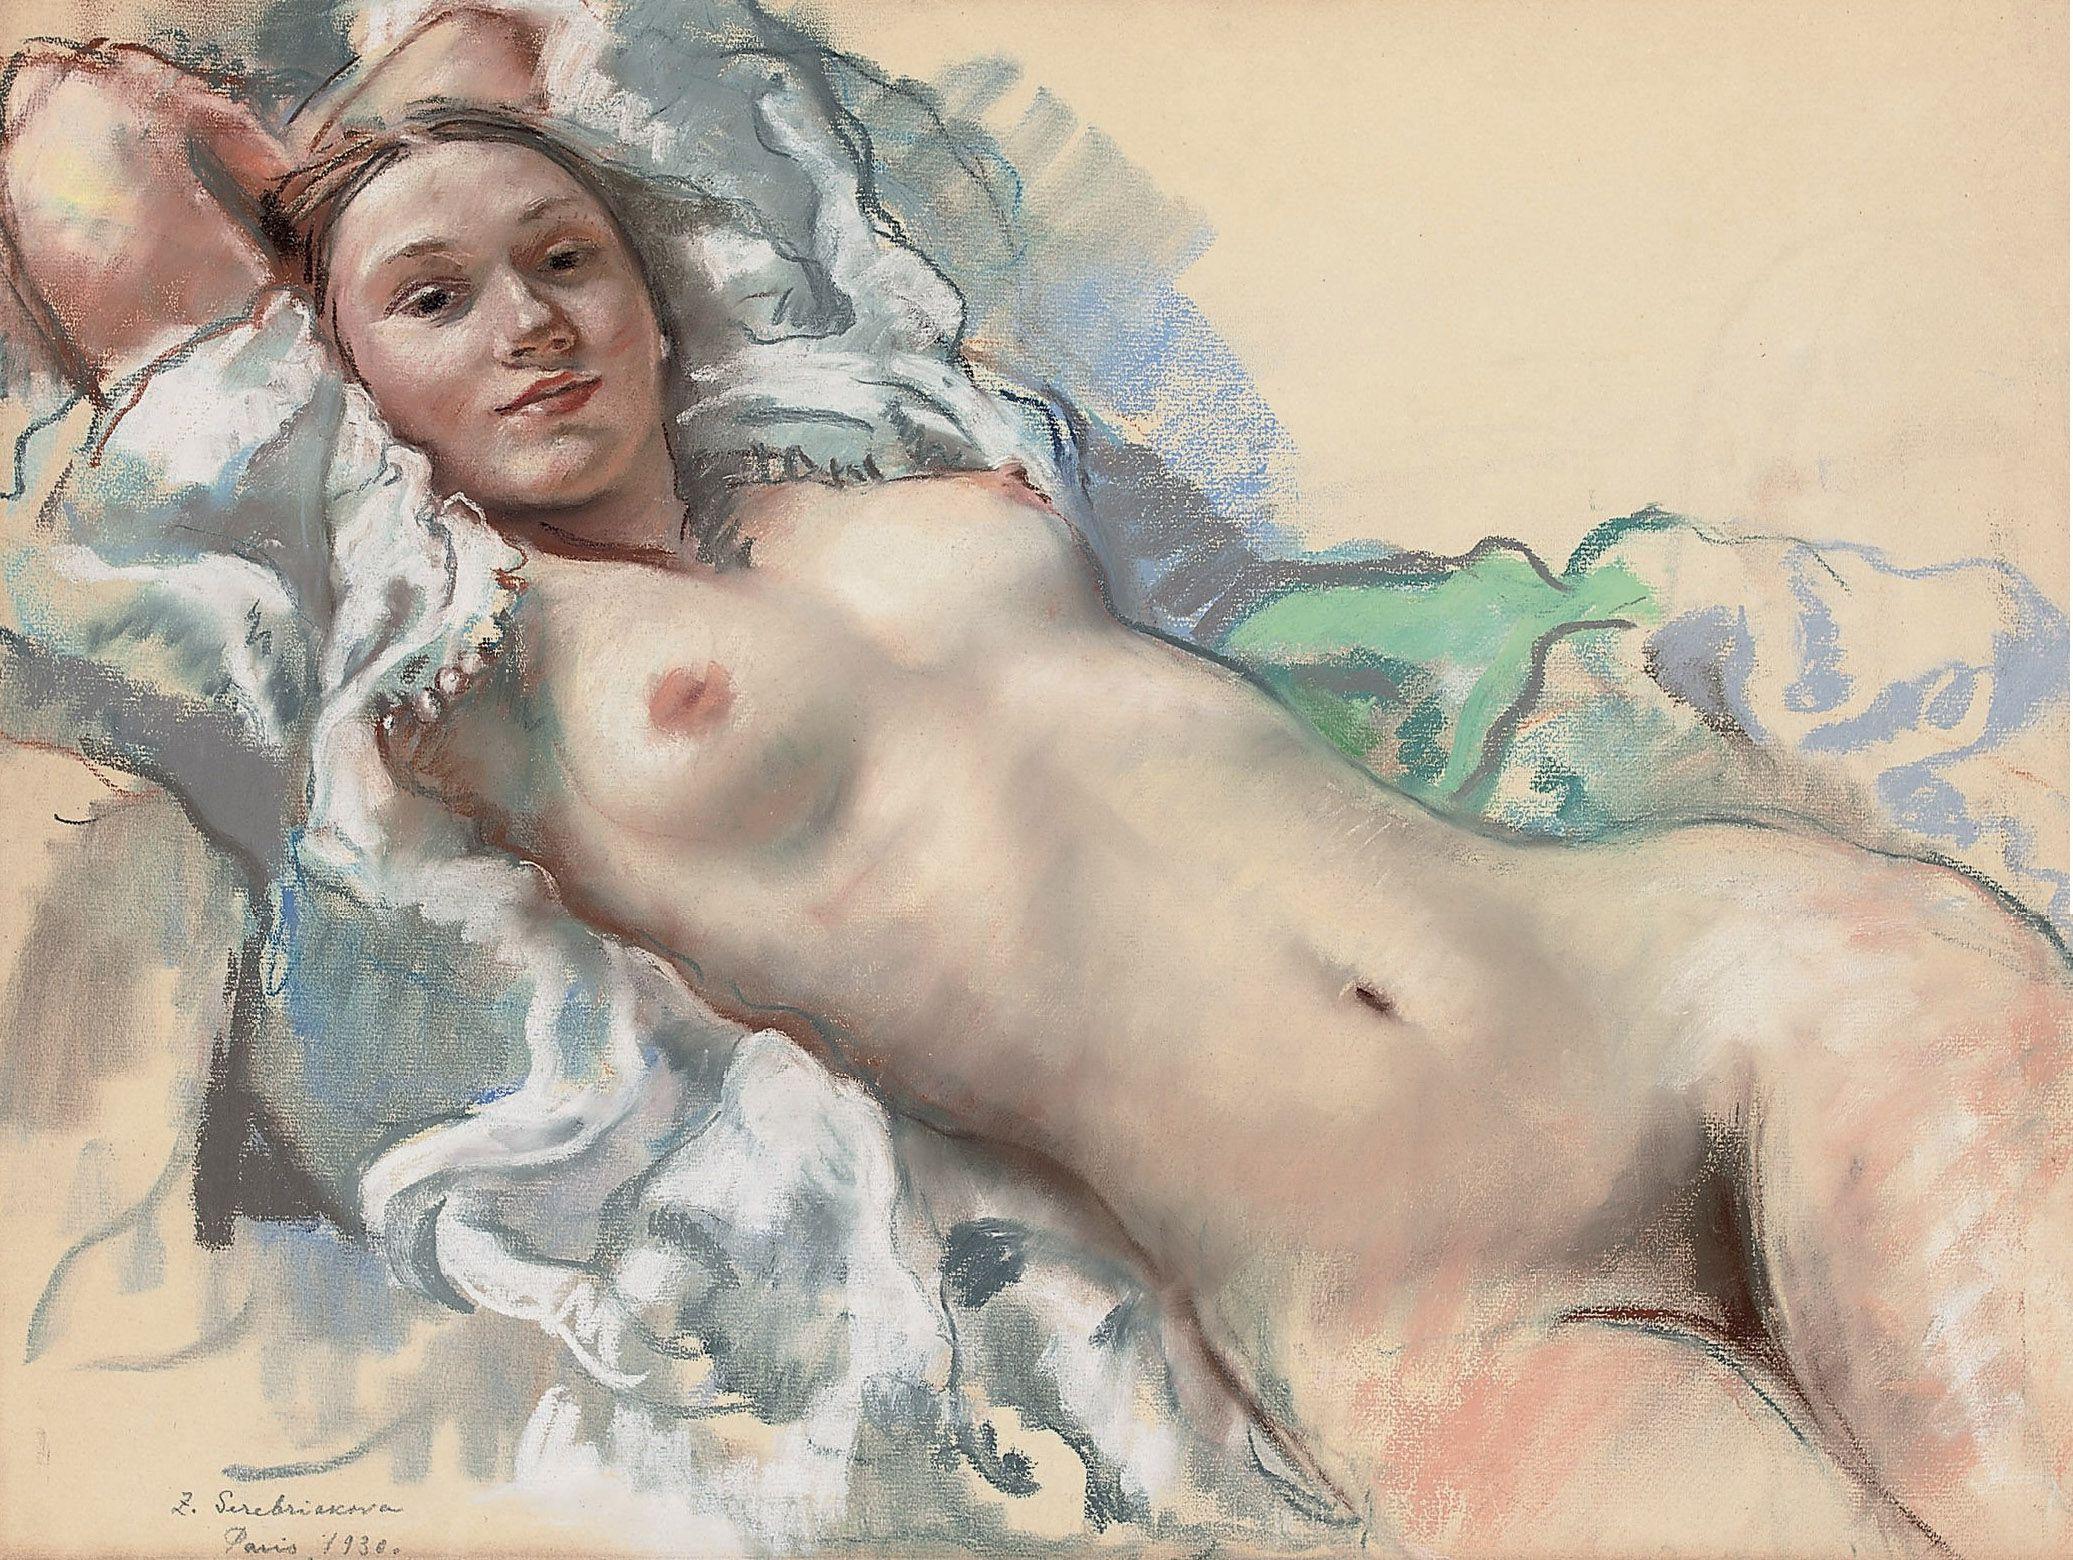 Руски голи фото женшина 6 фотография